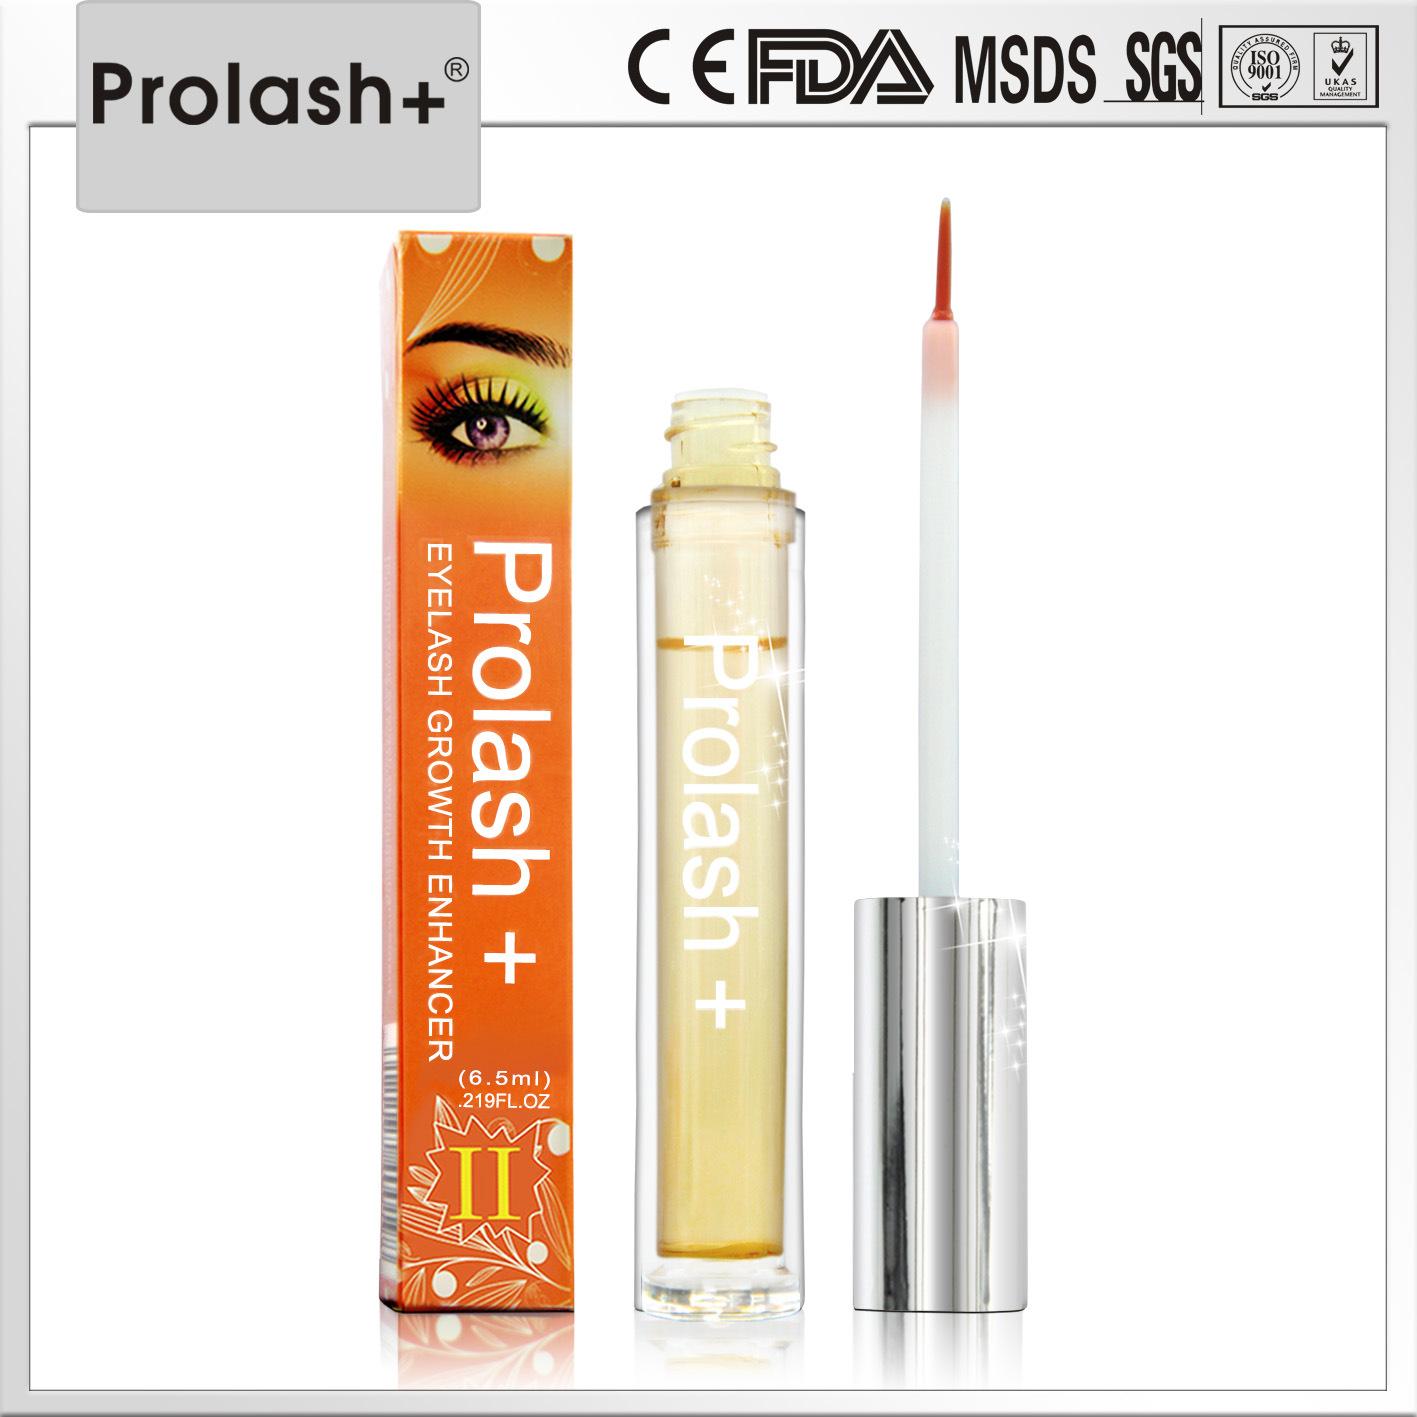 Prolash+ Eyelashes Easy Application Eyelash Growth Liquid Cosmetic